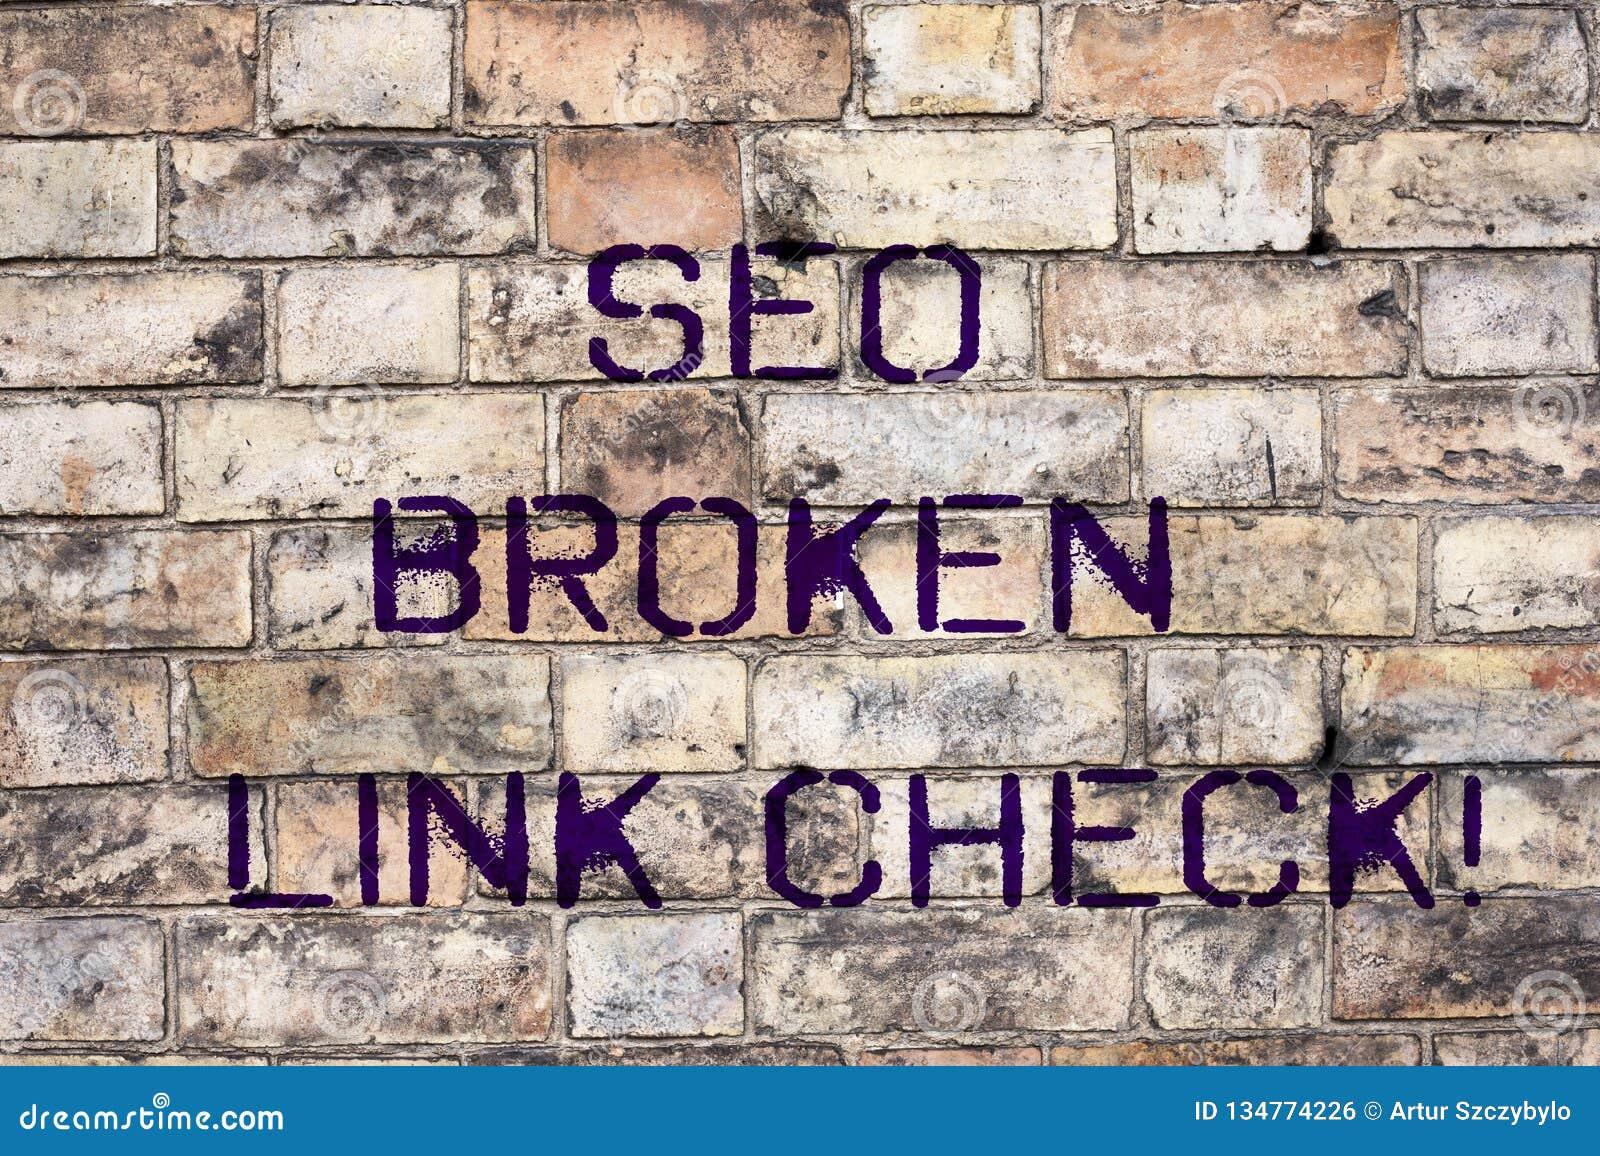 Handschriftstext Seo Broken Link Check Konzept, das Suchmaschinen-Optimierungs-Fehler in den Websiteverbindungen bedeutet